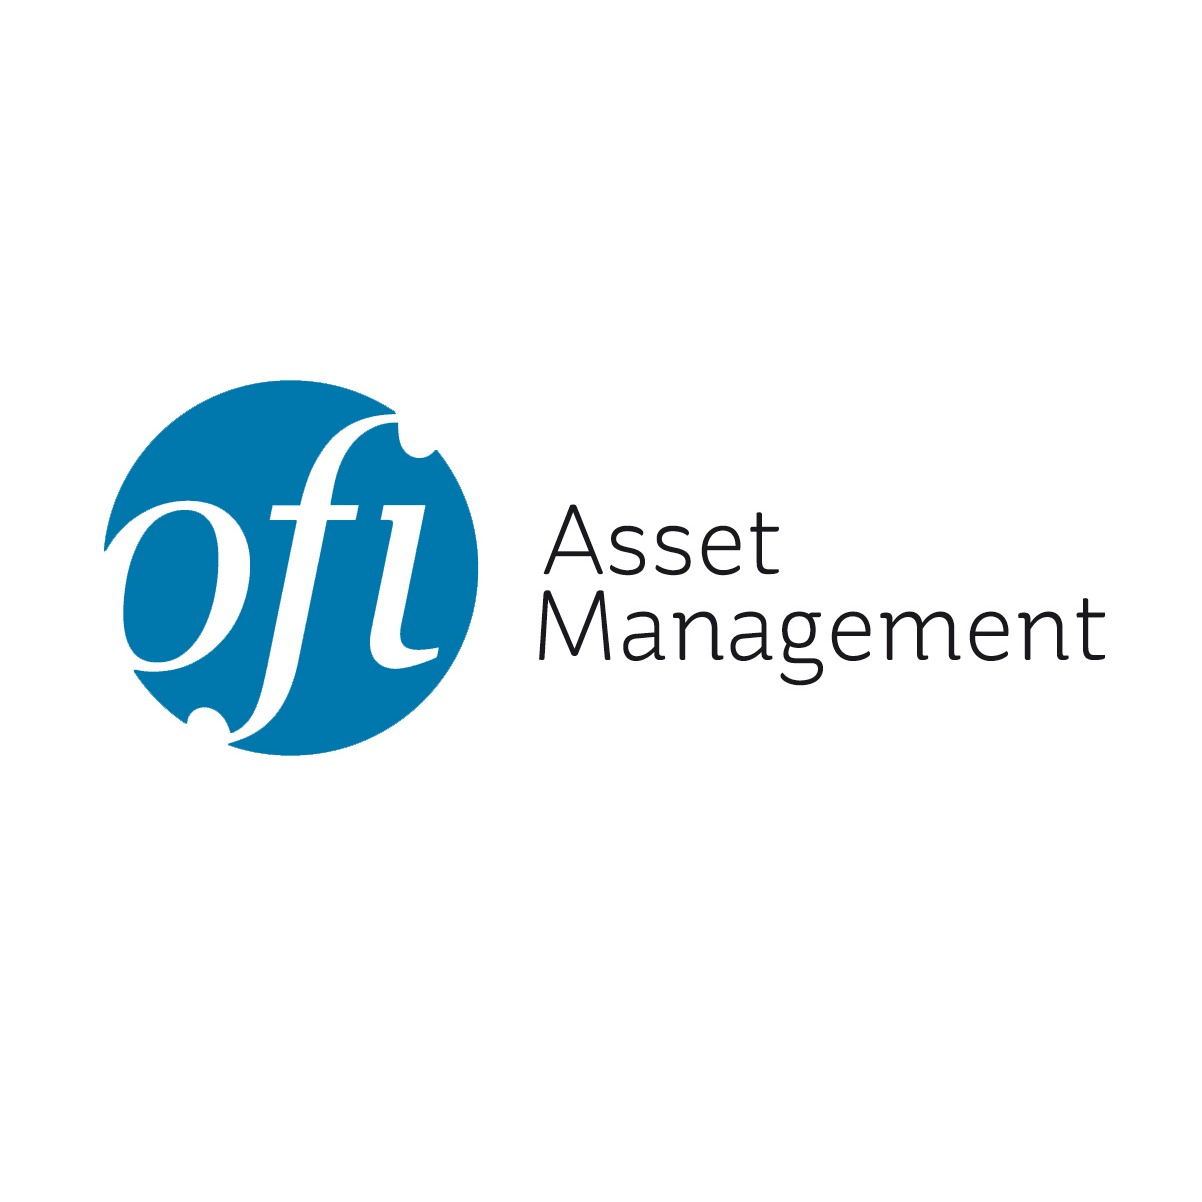 the Ofi Asset Management logo.